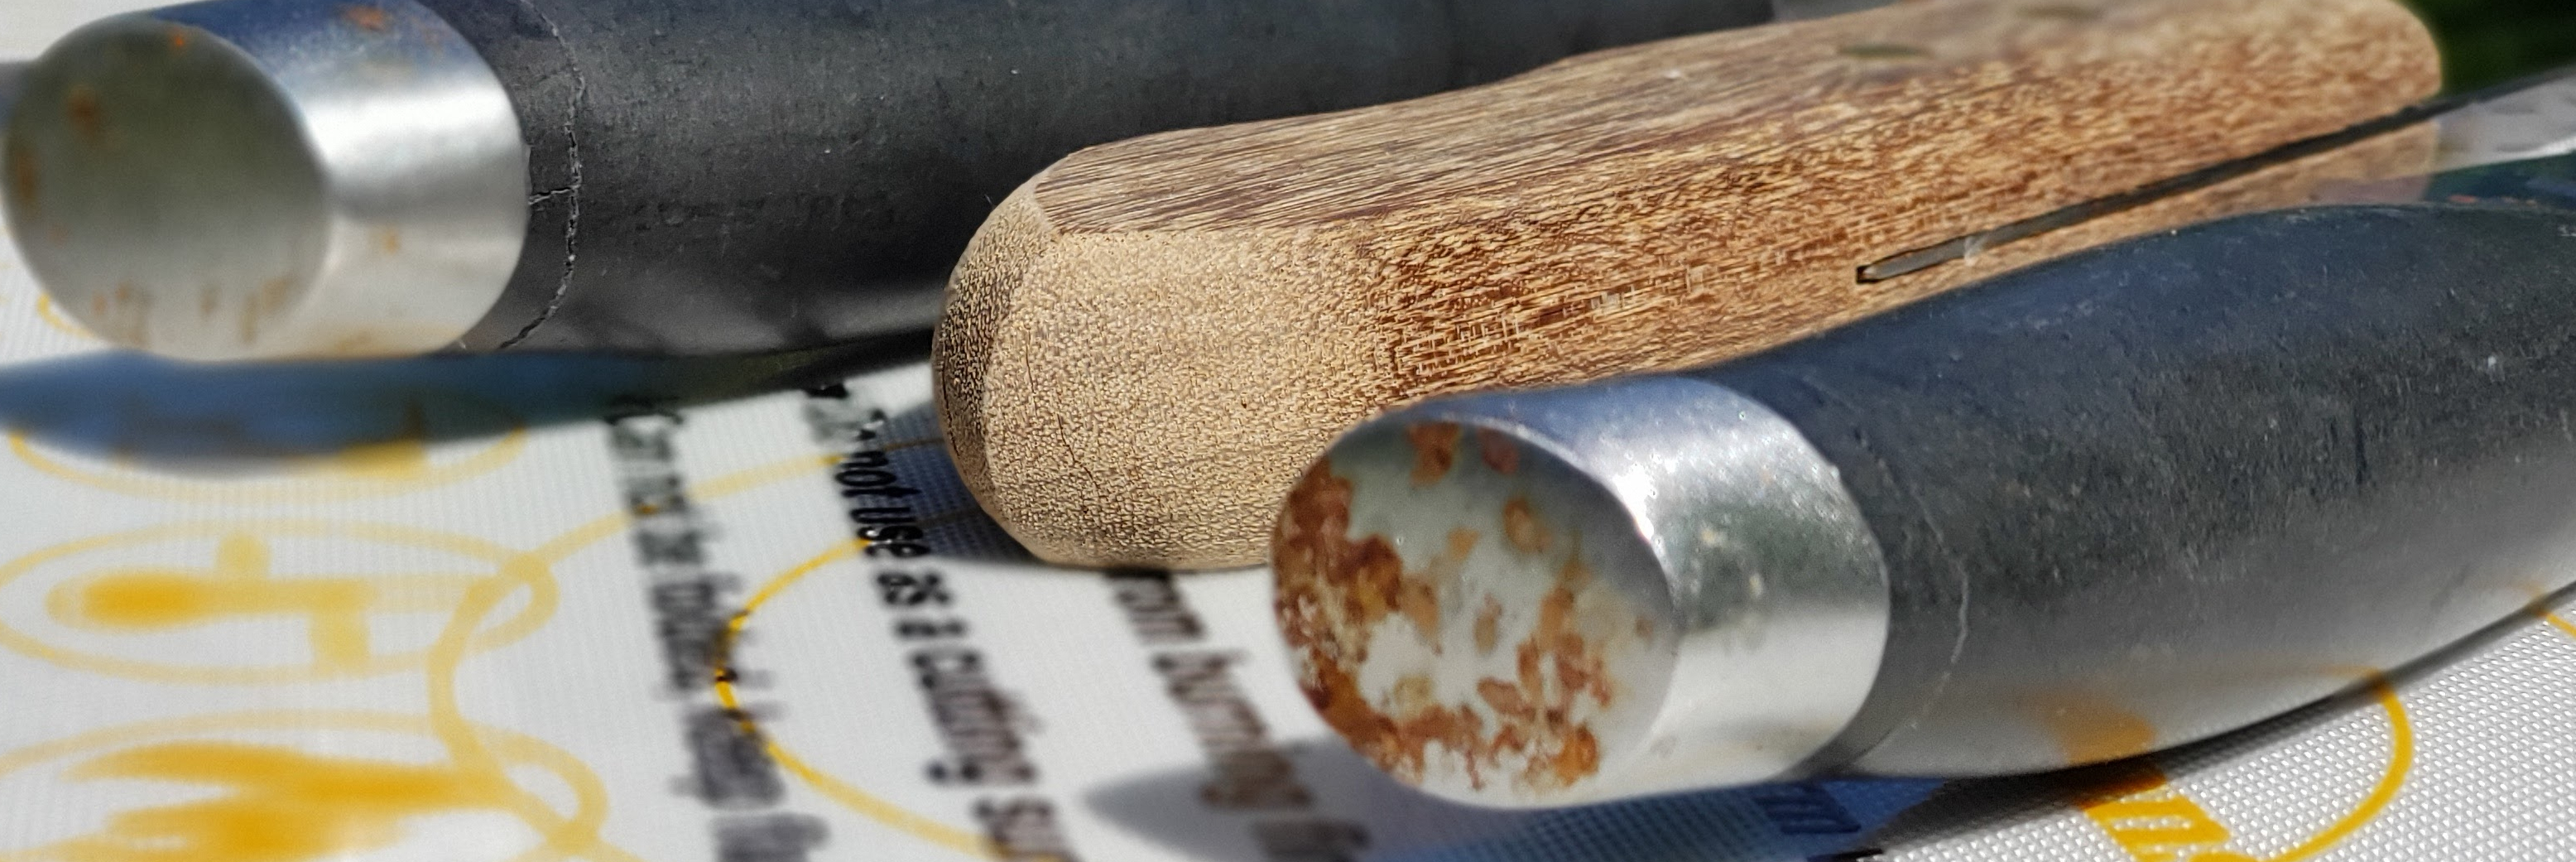 rusty knife handles